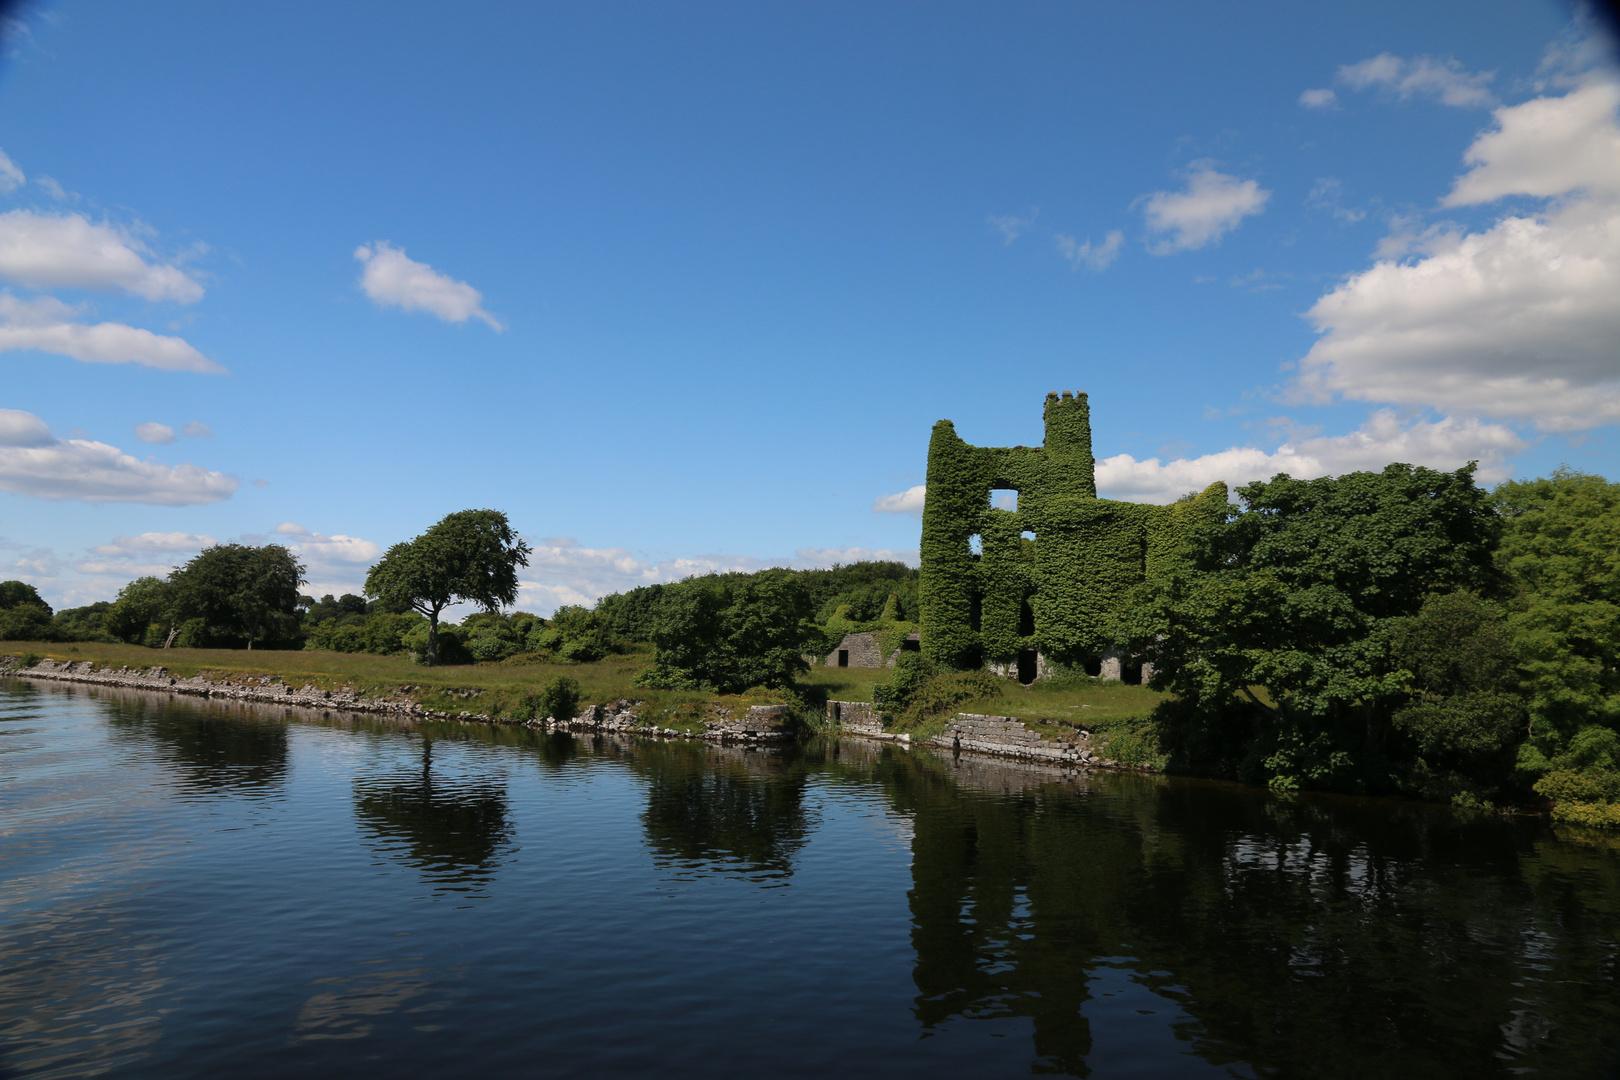 Menlo Castle am Lough Corrib 6.2014